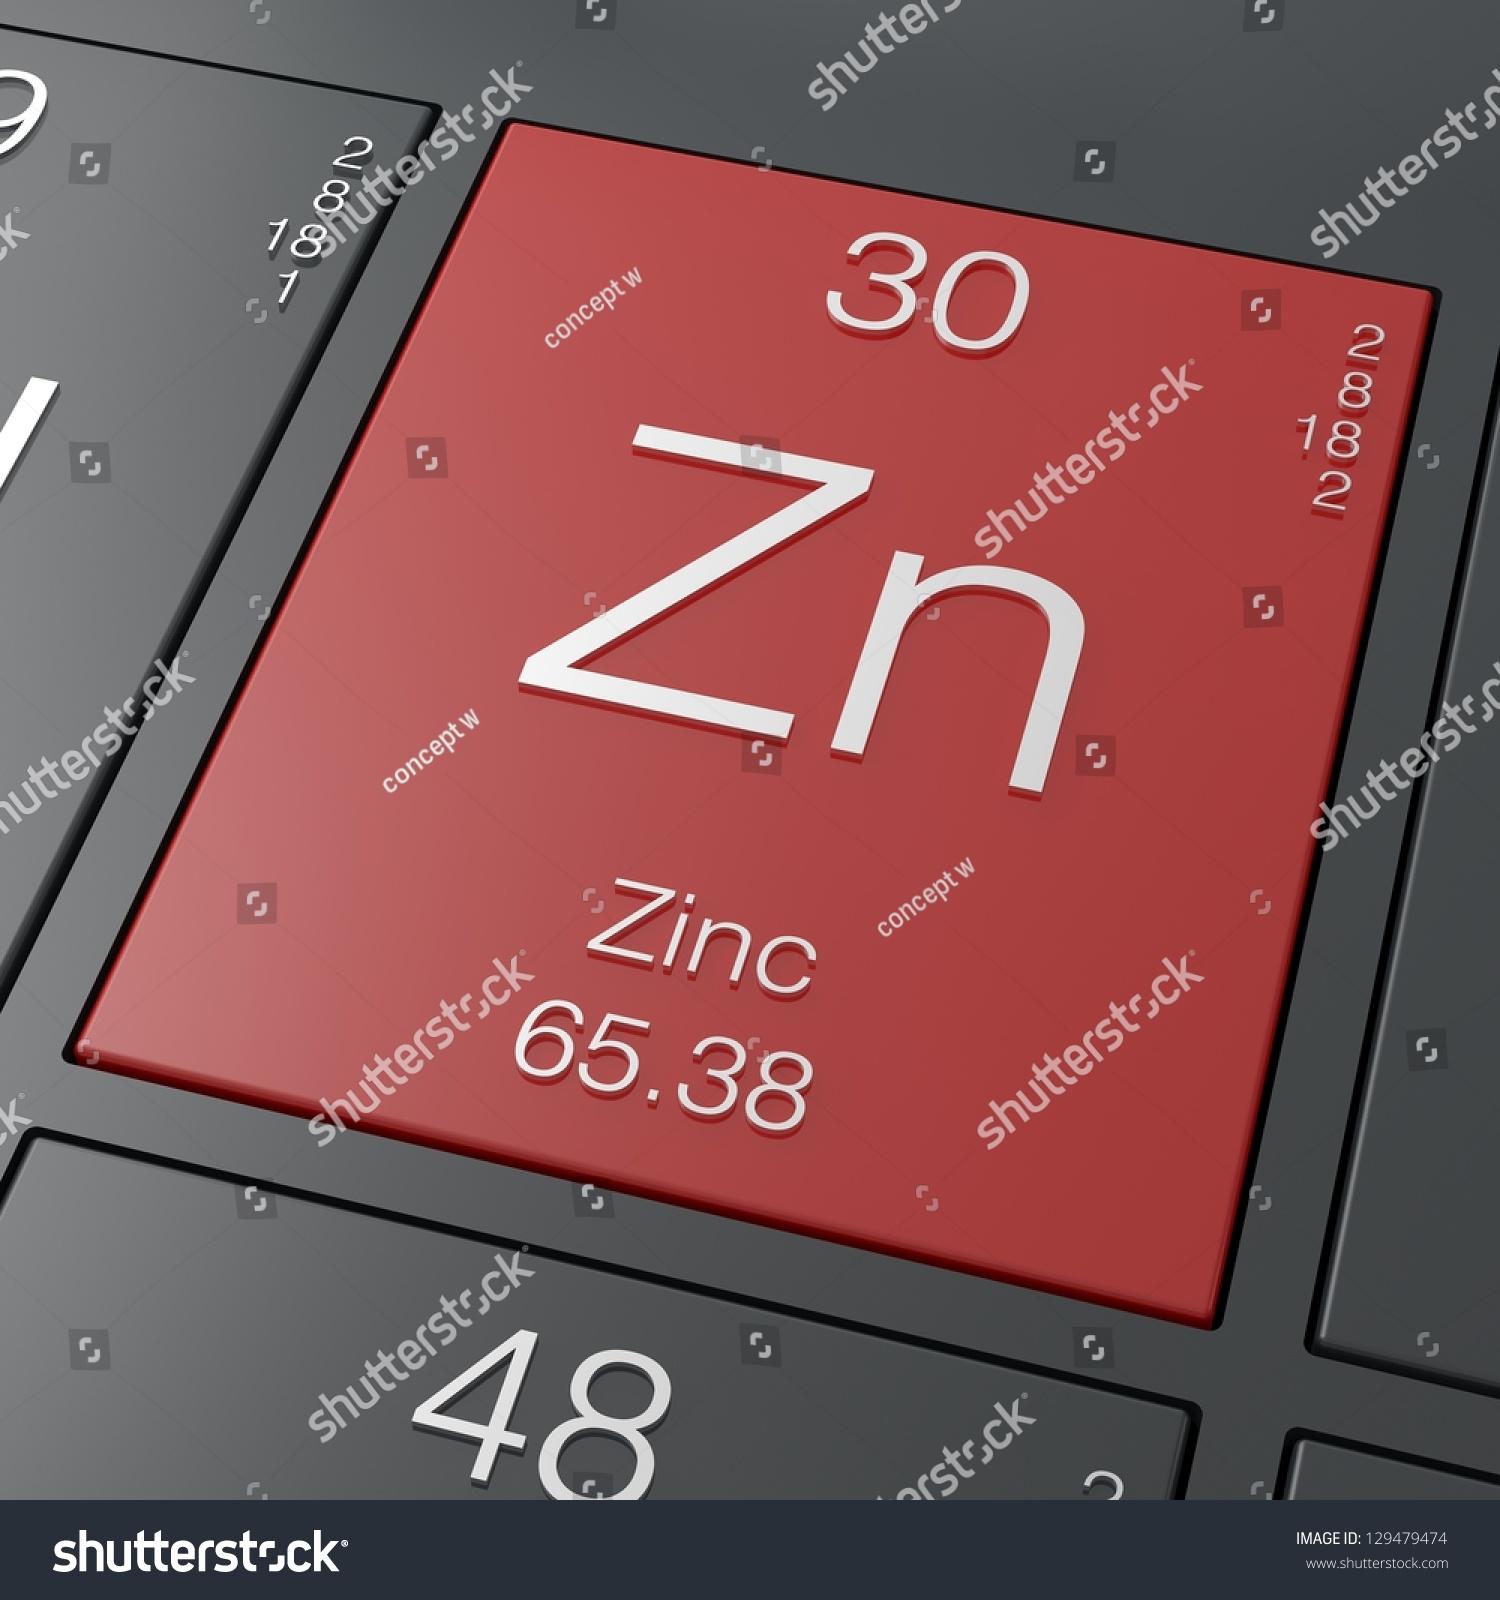 Zinc element periodic table stock illustration 129479474 zinc element from periodic table gamestrikefo Gallery